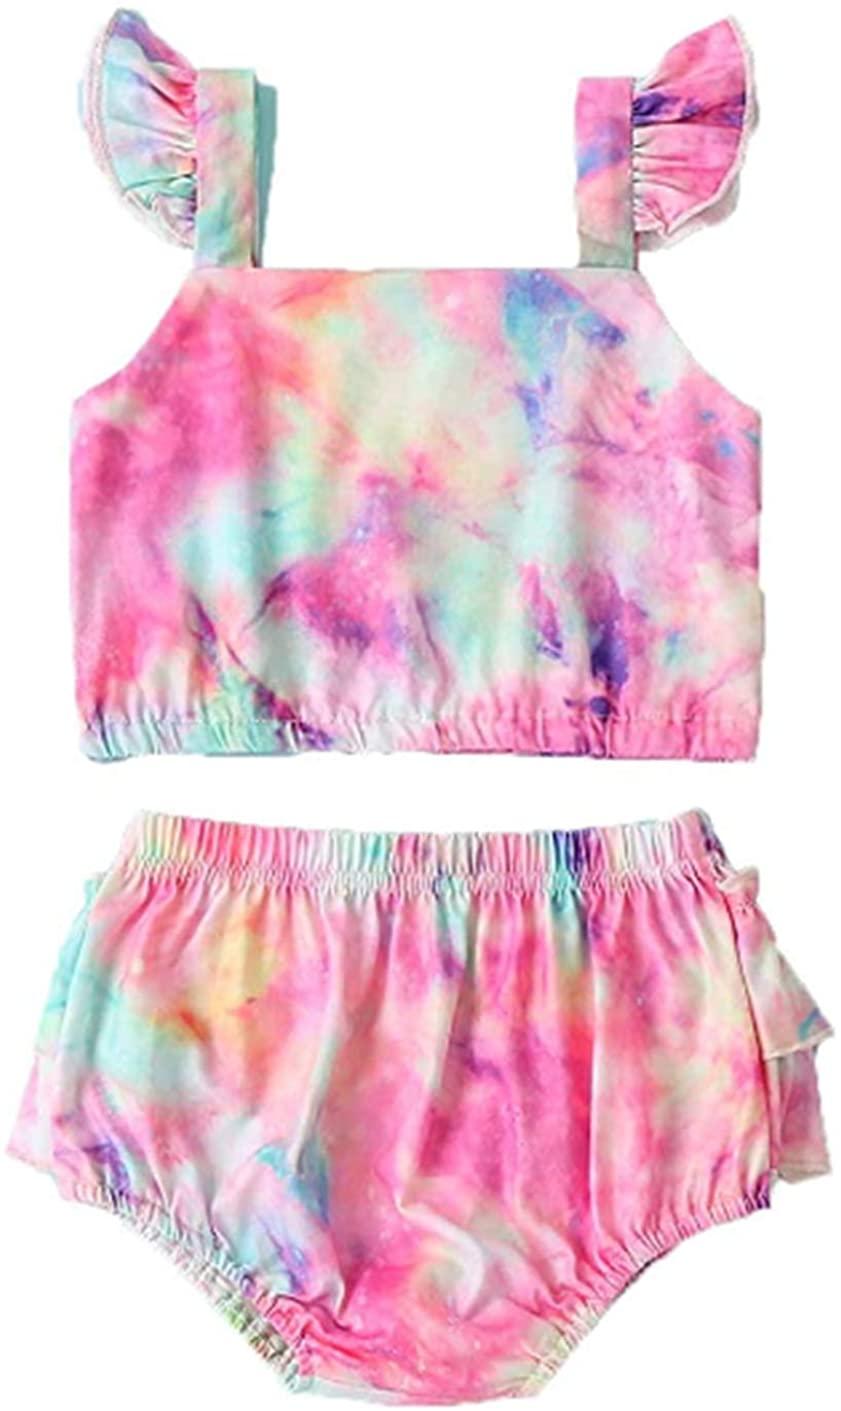 Newborn Baby Girls Swimsuit Tie-Dye Halter Sleeveless Crop Top+Briefs Shorts Swimwear Bikini 2Pcs Summer Outfit